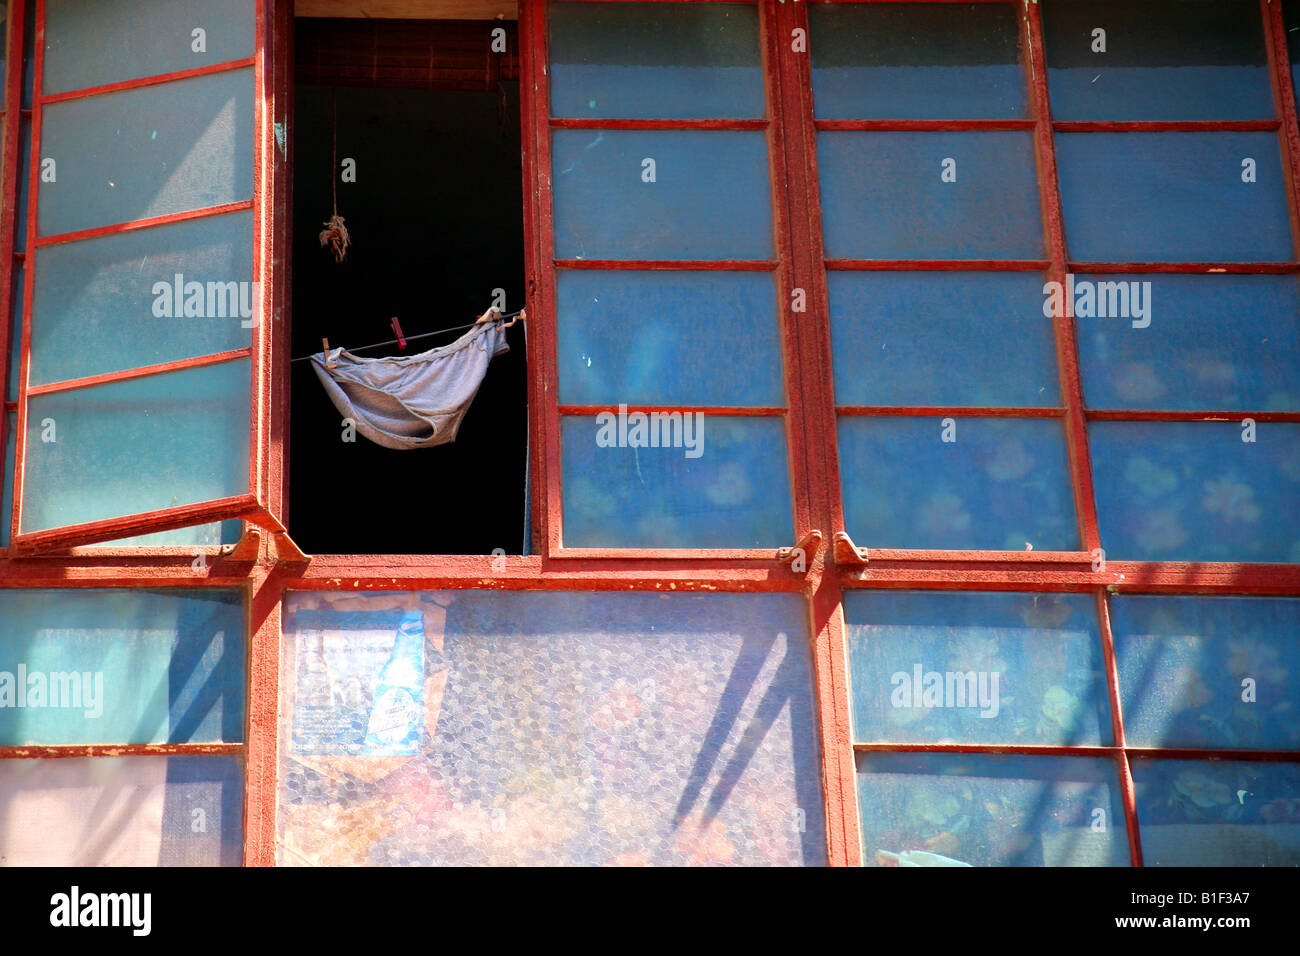 pant window - Stock Image